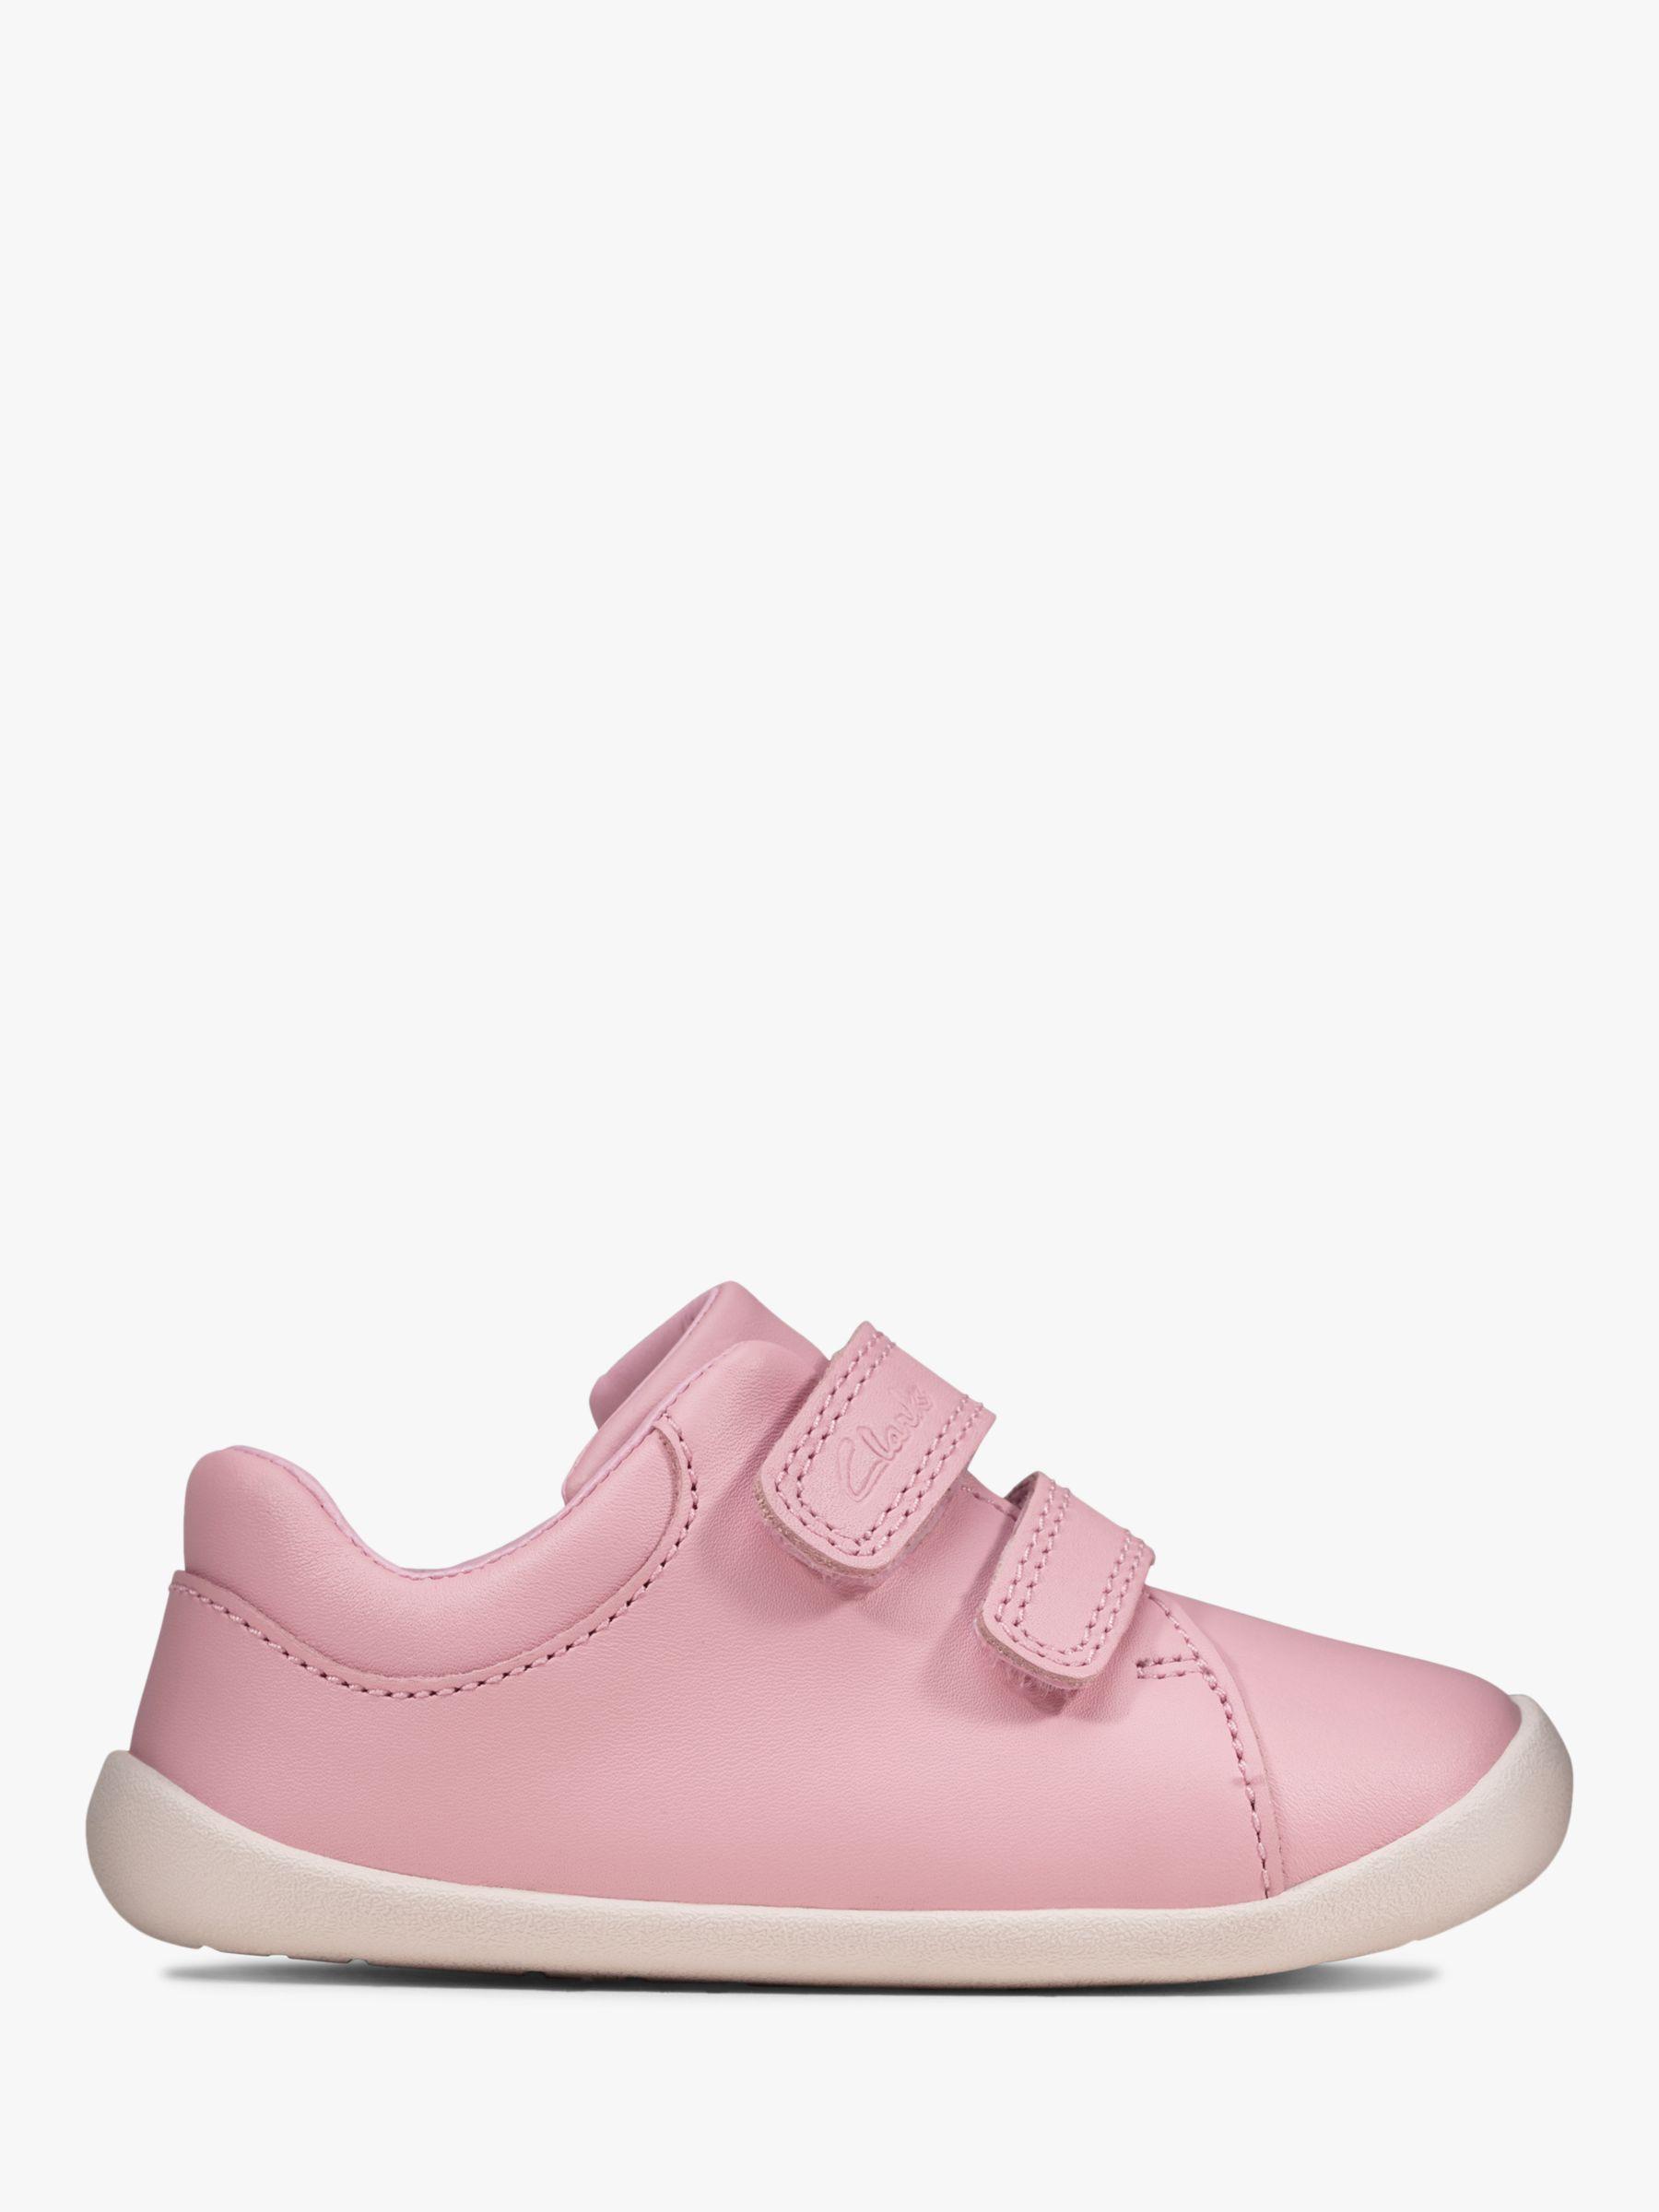 Clarks Children's Roamer Craft Pre-Walker Shoes, Pink at ...